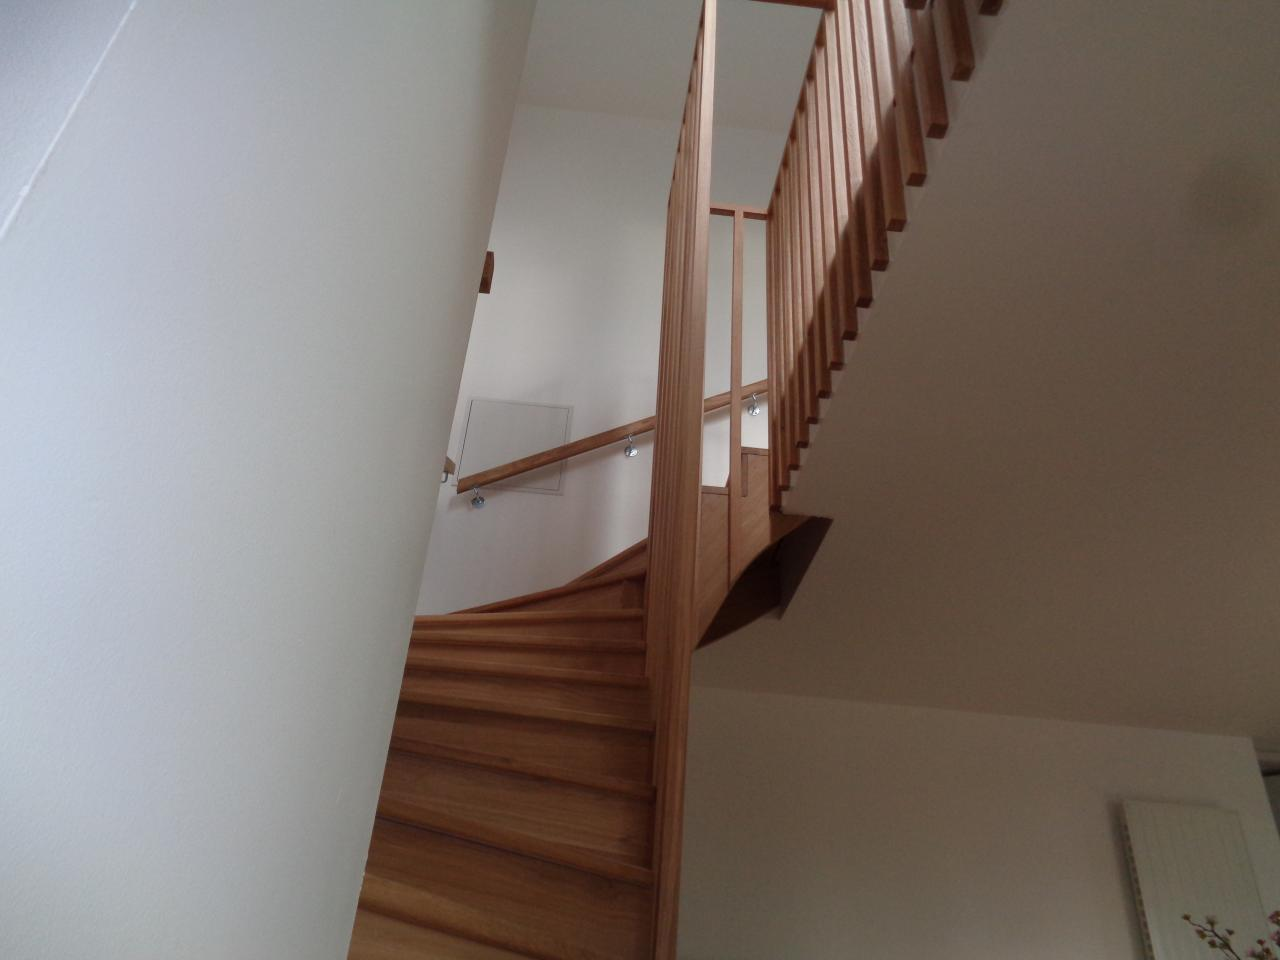 Escalier & garde corps sur mesure.